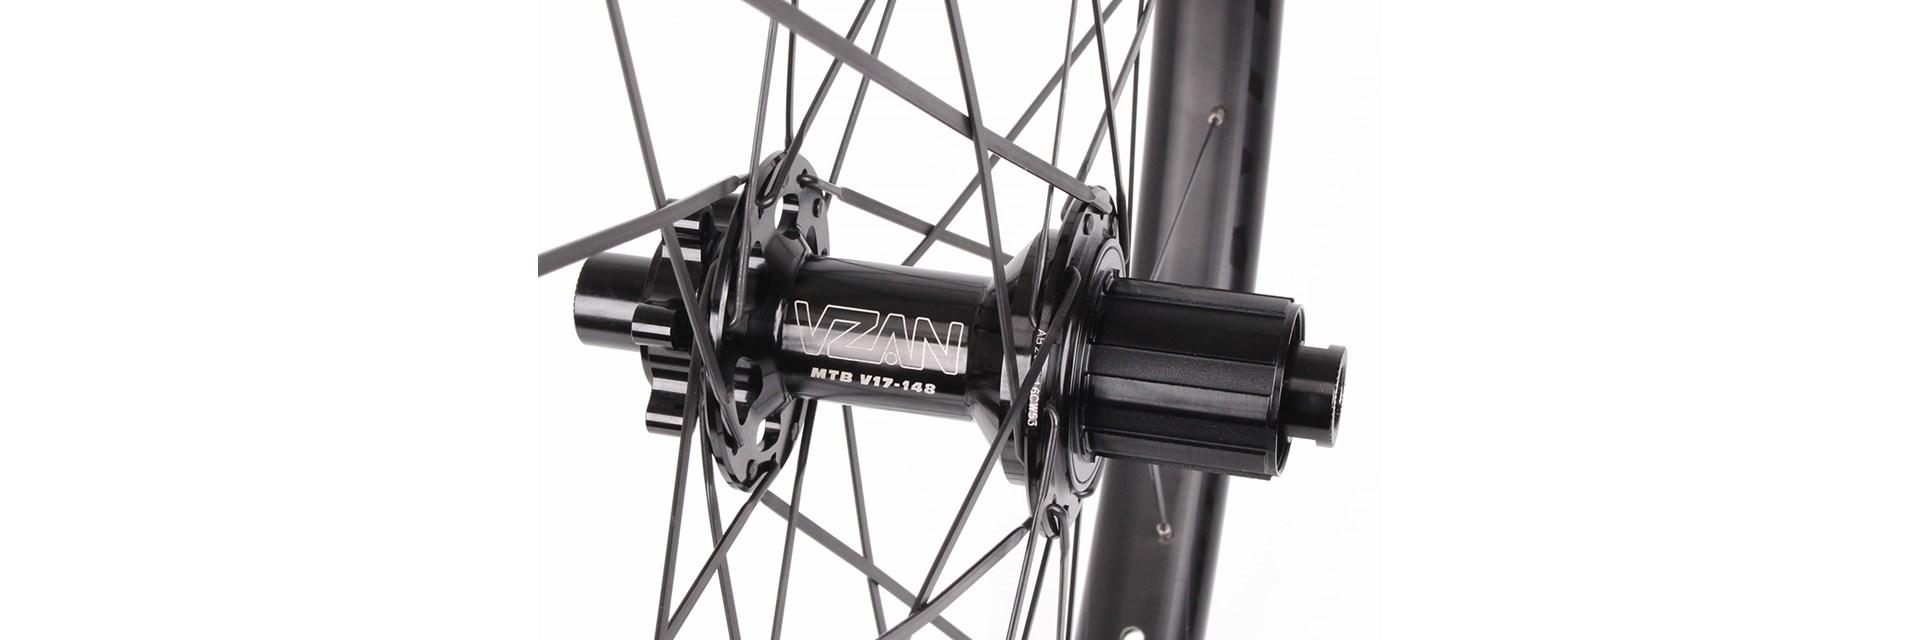 Roda Enduro Plus 27,5 Boost